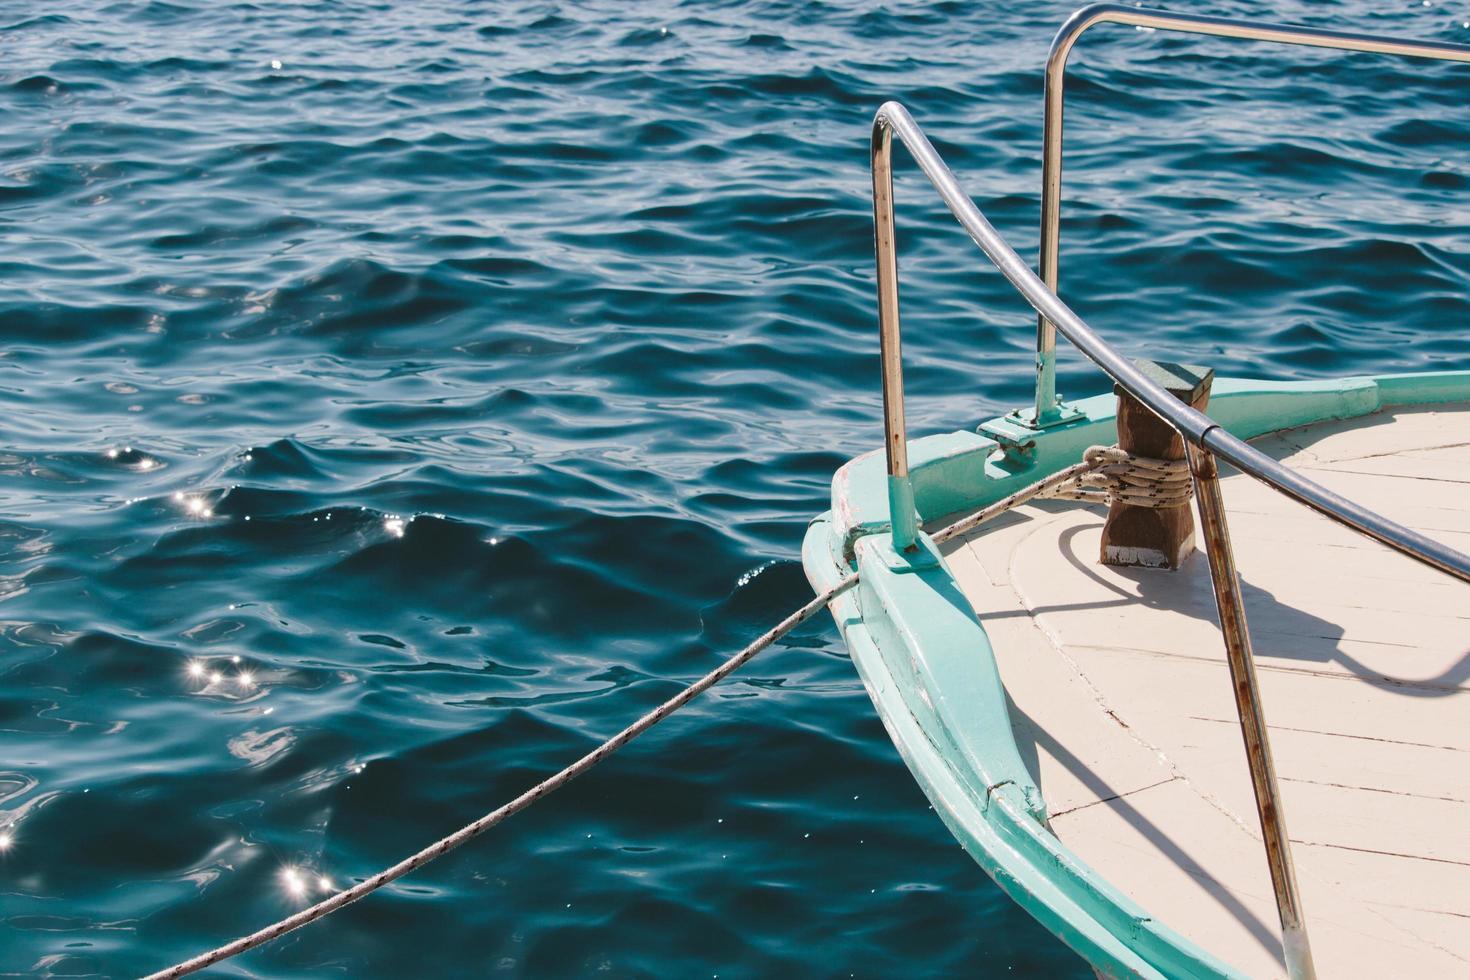 Segelboot auf dem Meer foto